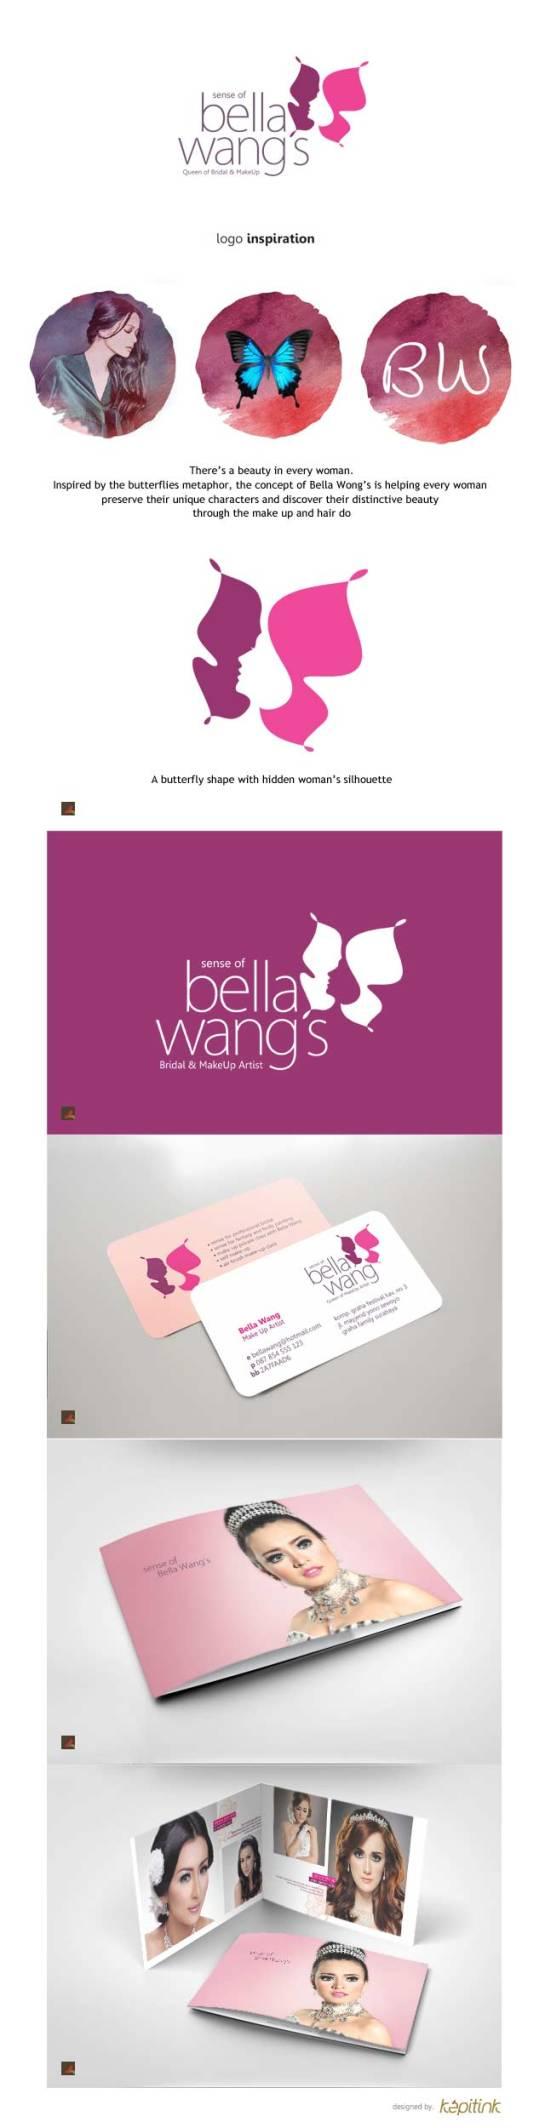 Bella Wang's Identity